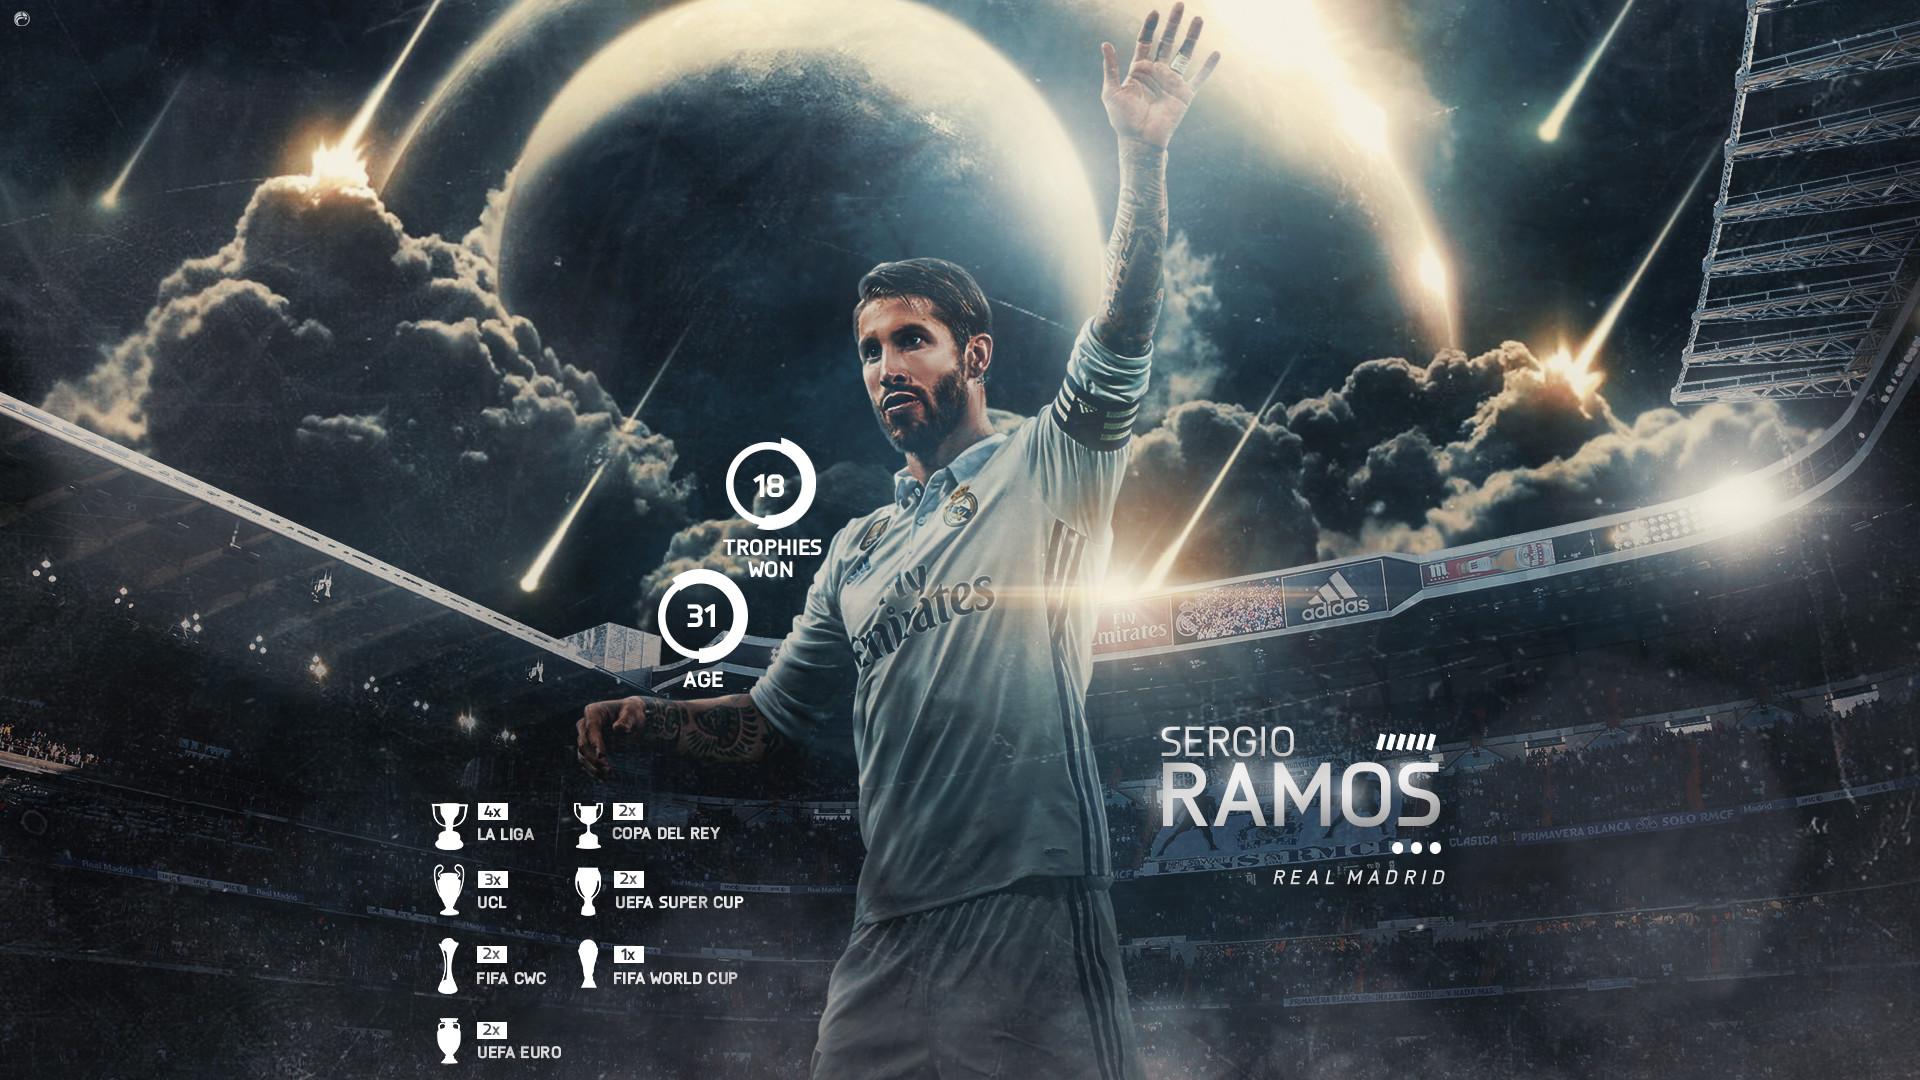 Sergio Ramos Wallpaper Hd